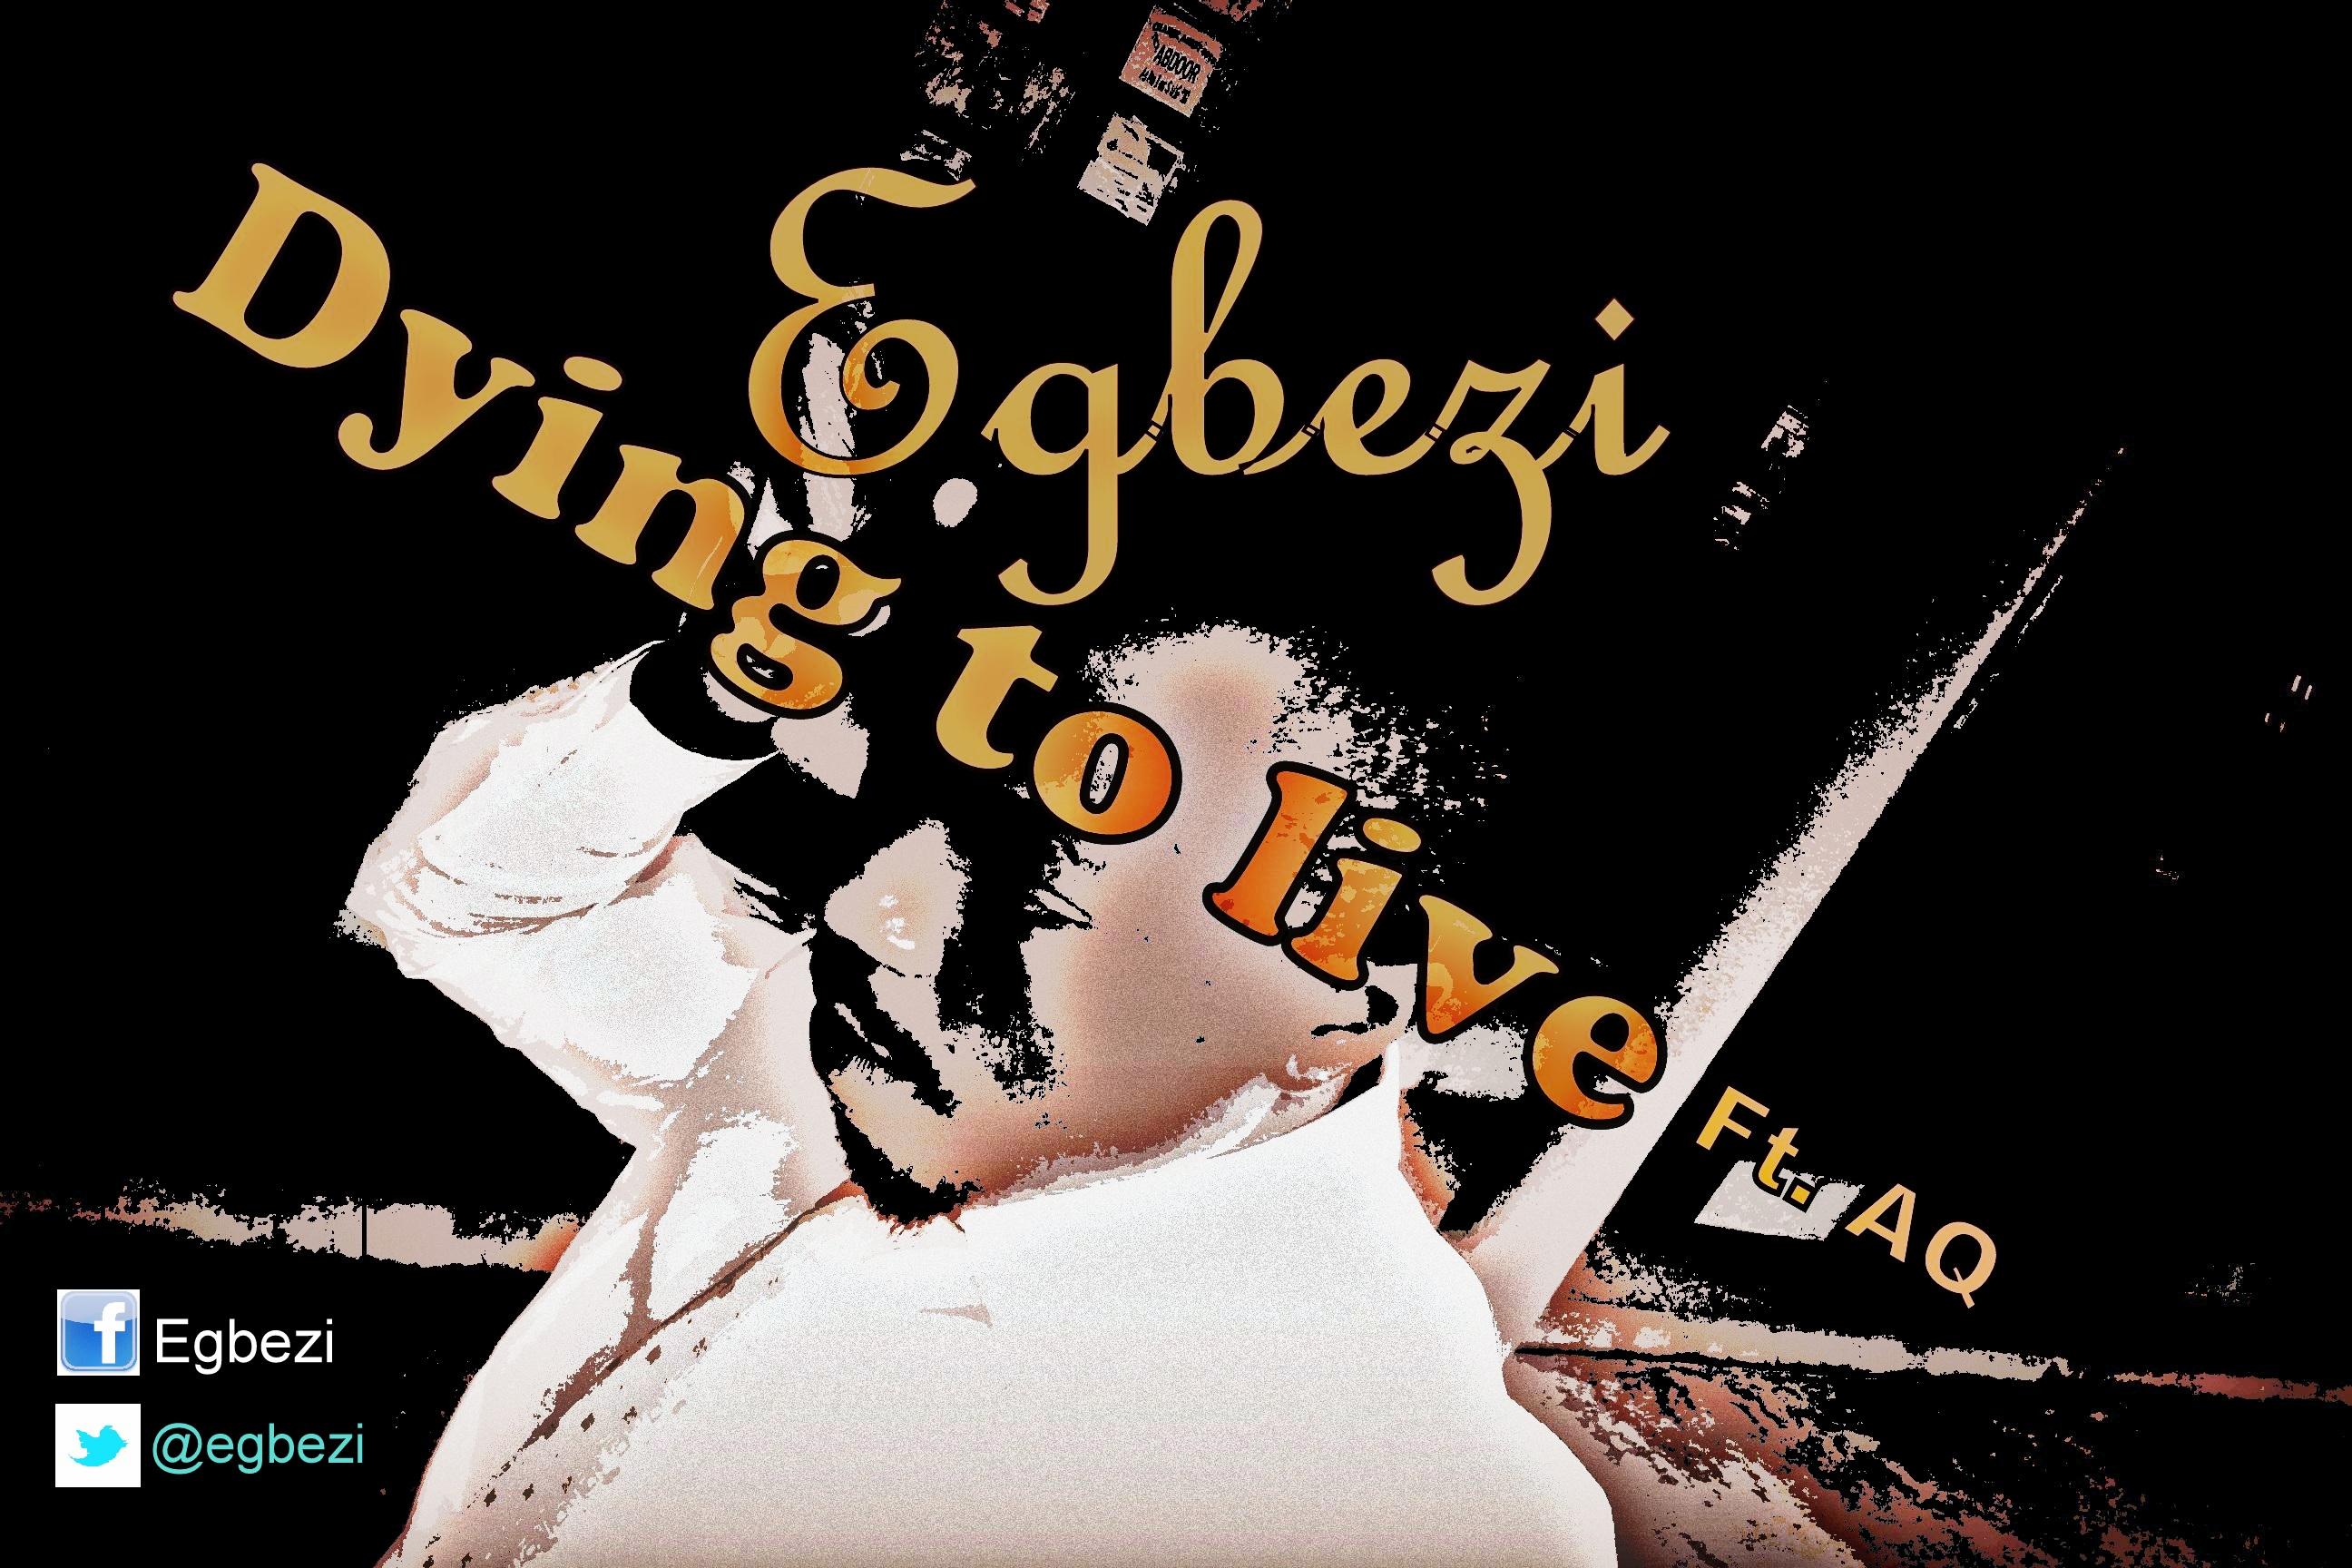 Egbezi ft. A-Q - Dying To Live Artwork | AceWorldTeam.com